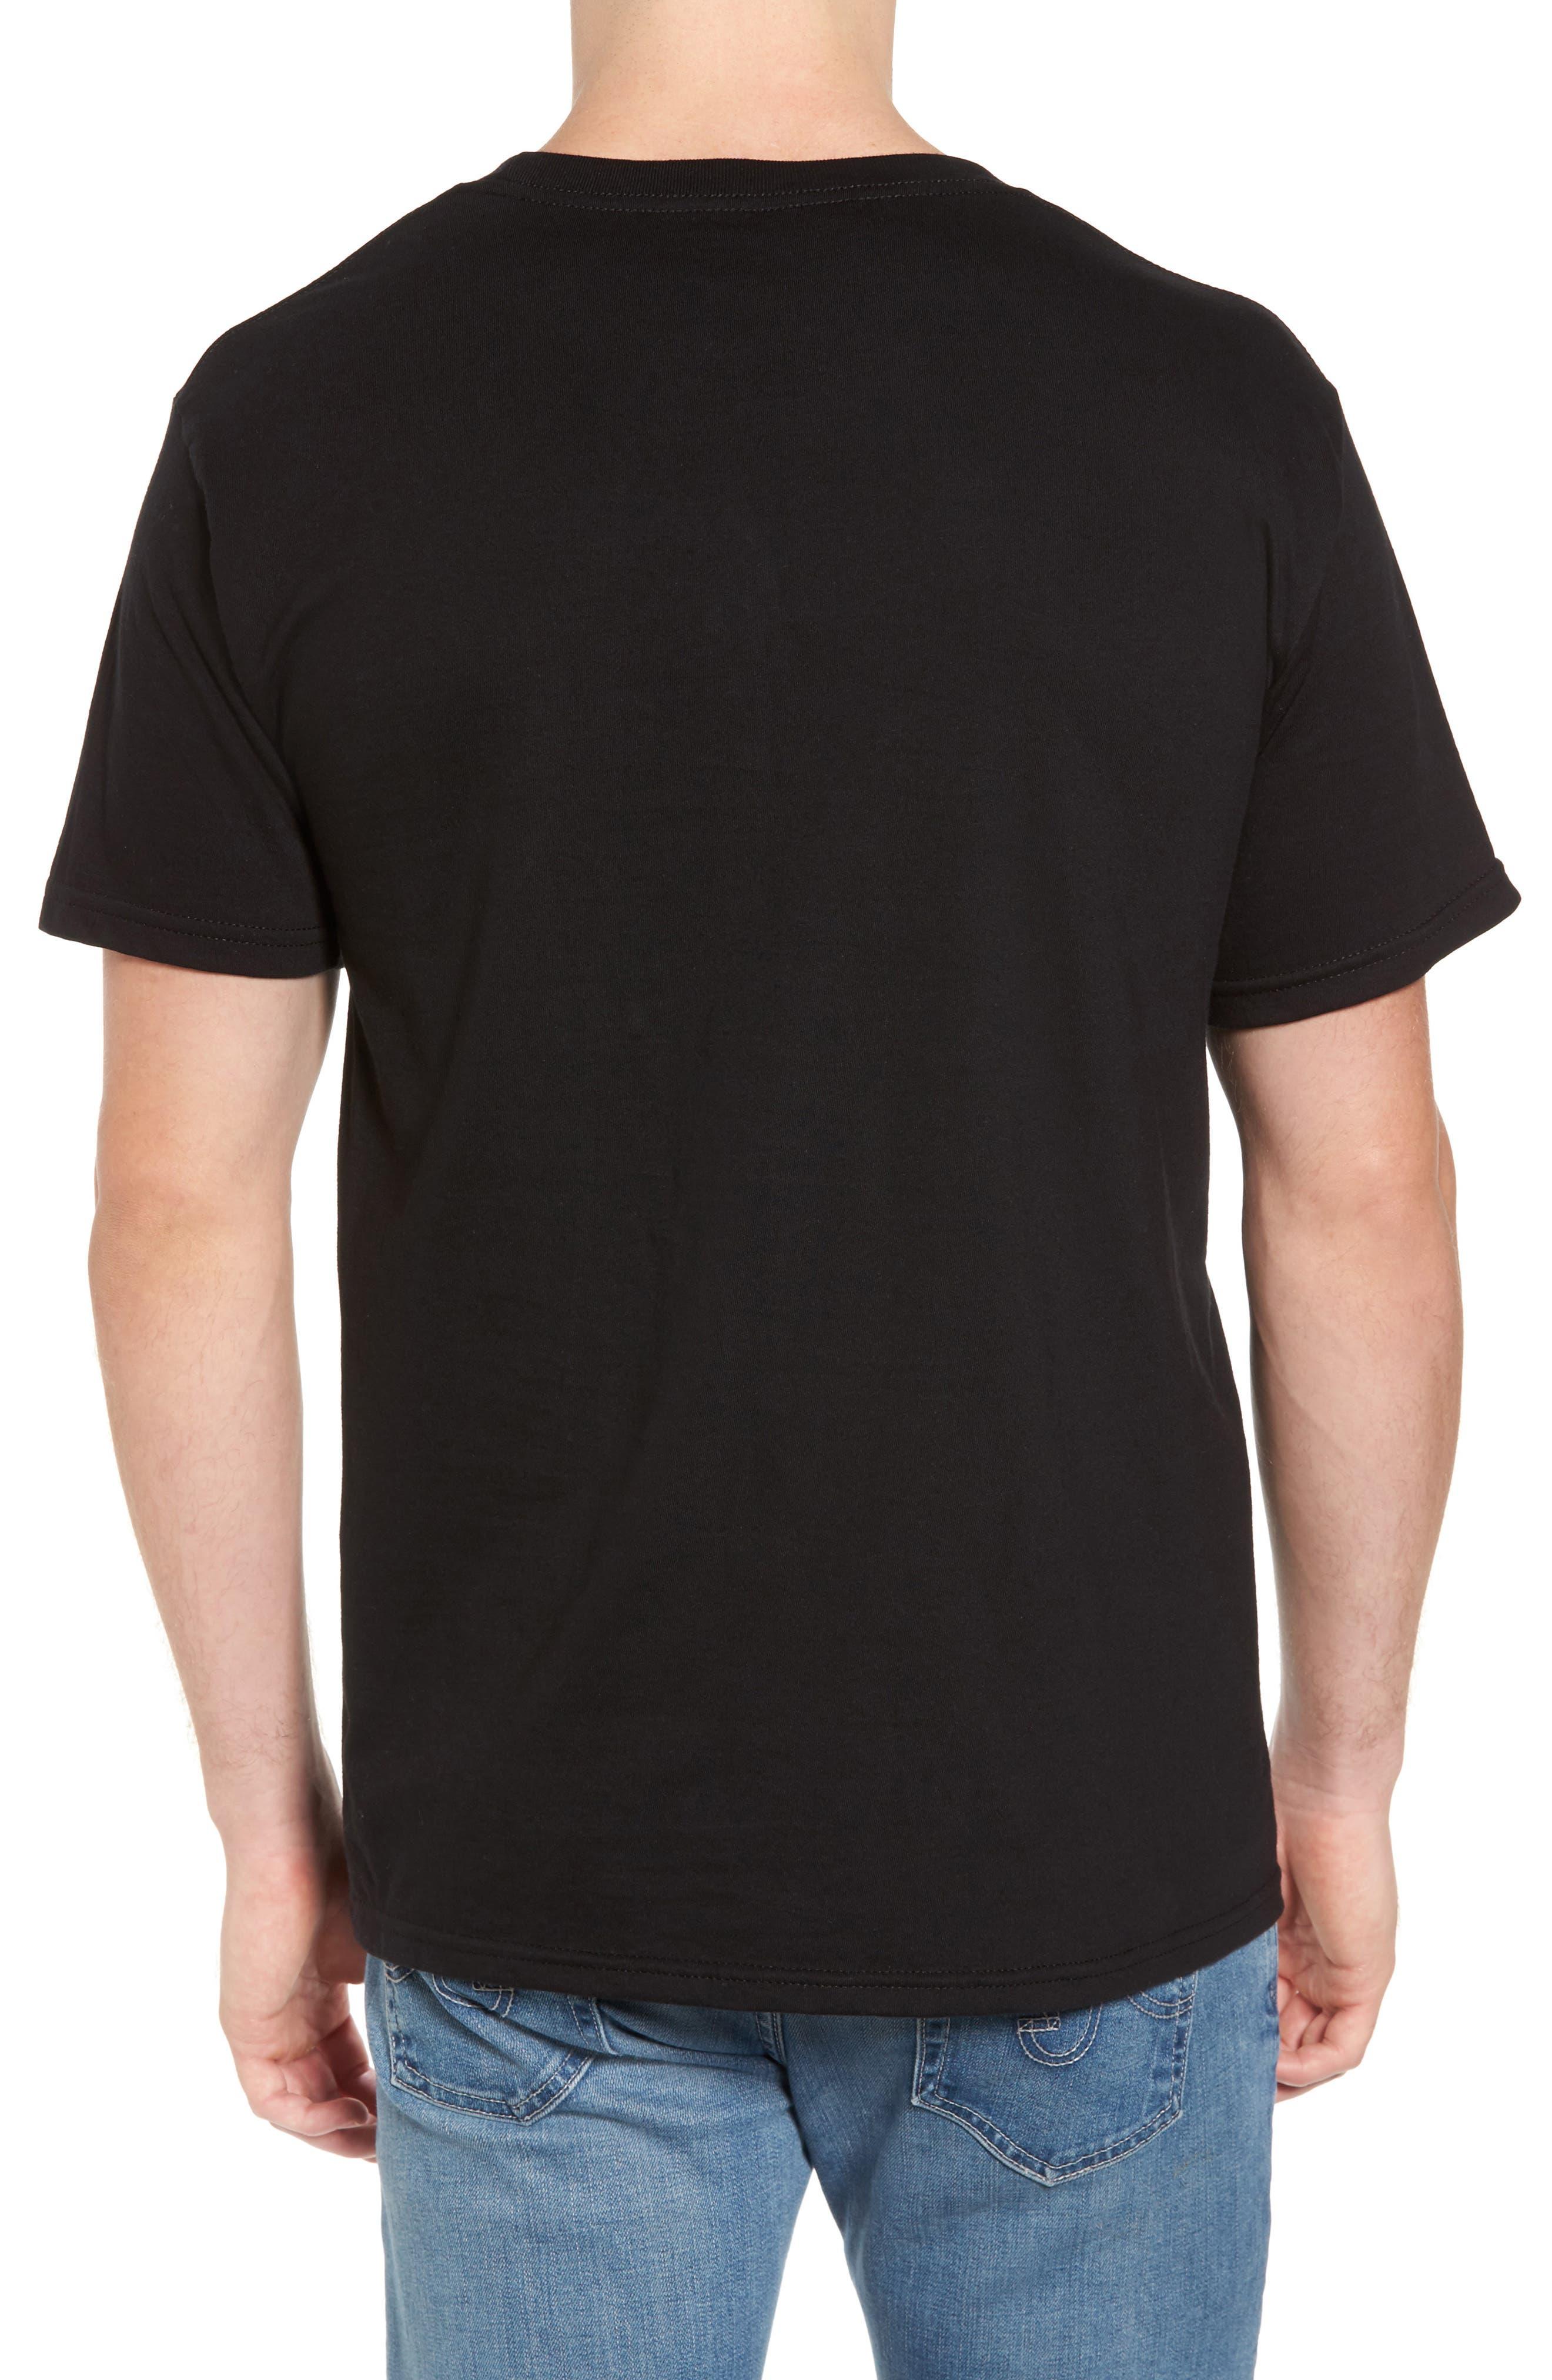 Far Out Cult Graphic T-Shirt,                             Alternate thumbnail 2, color,                             001